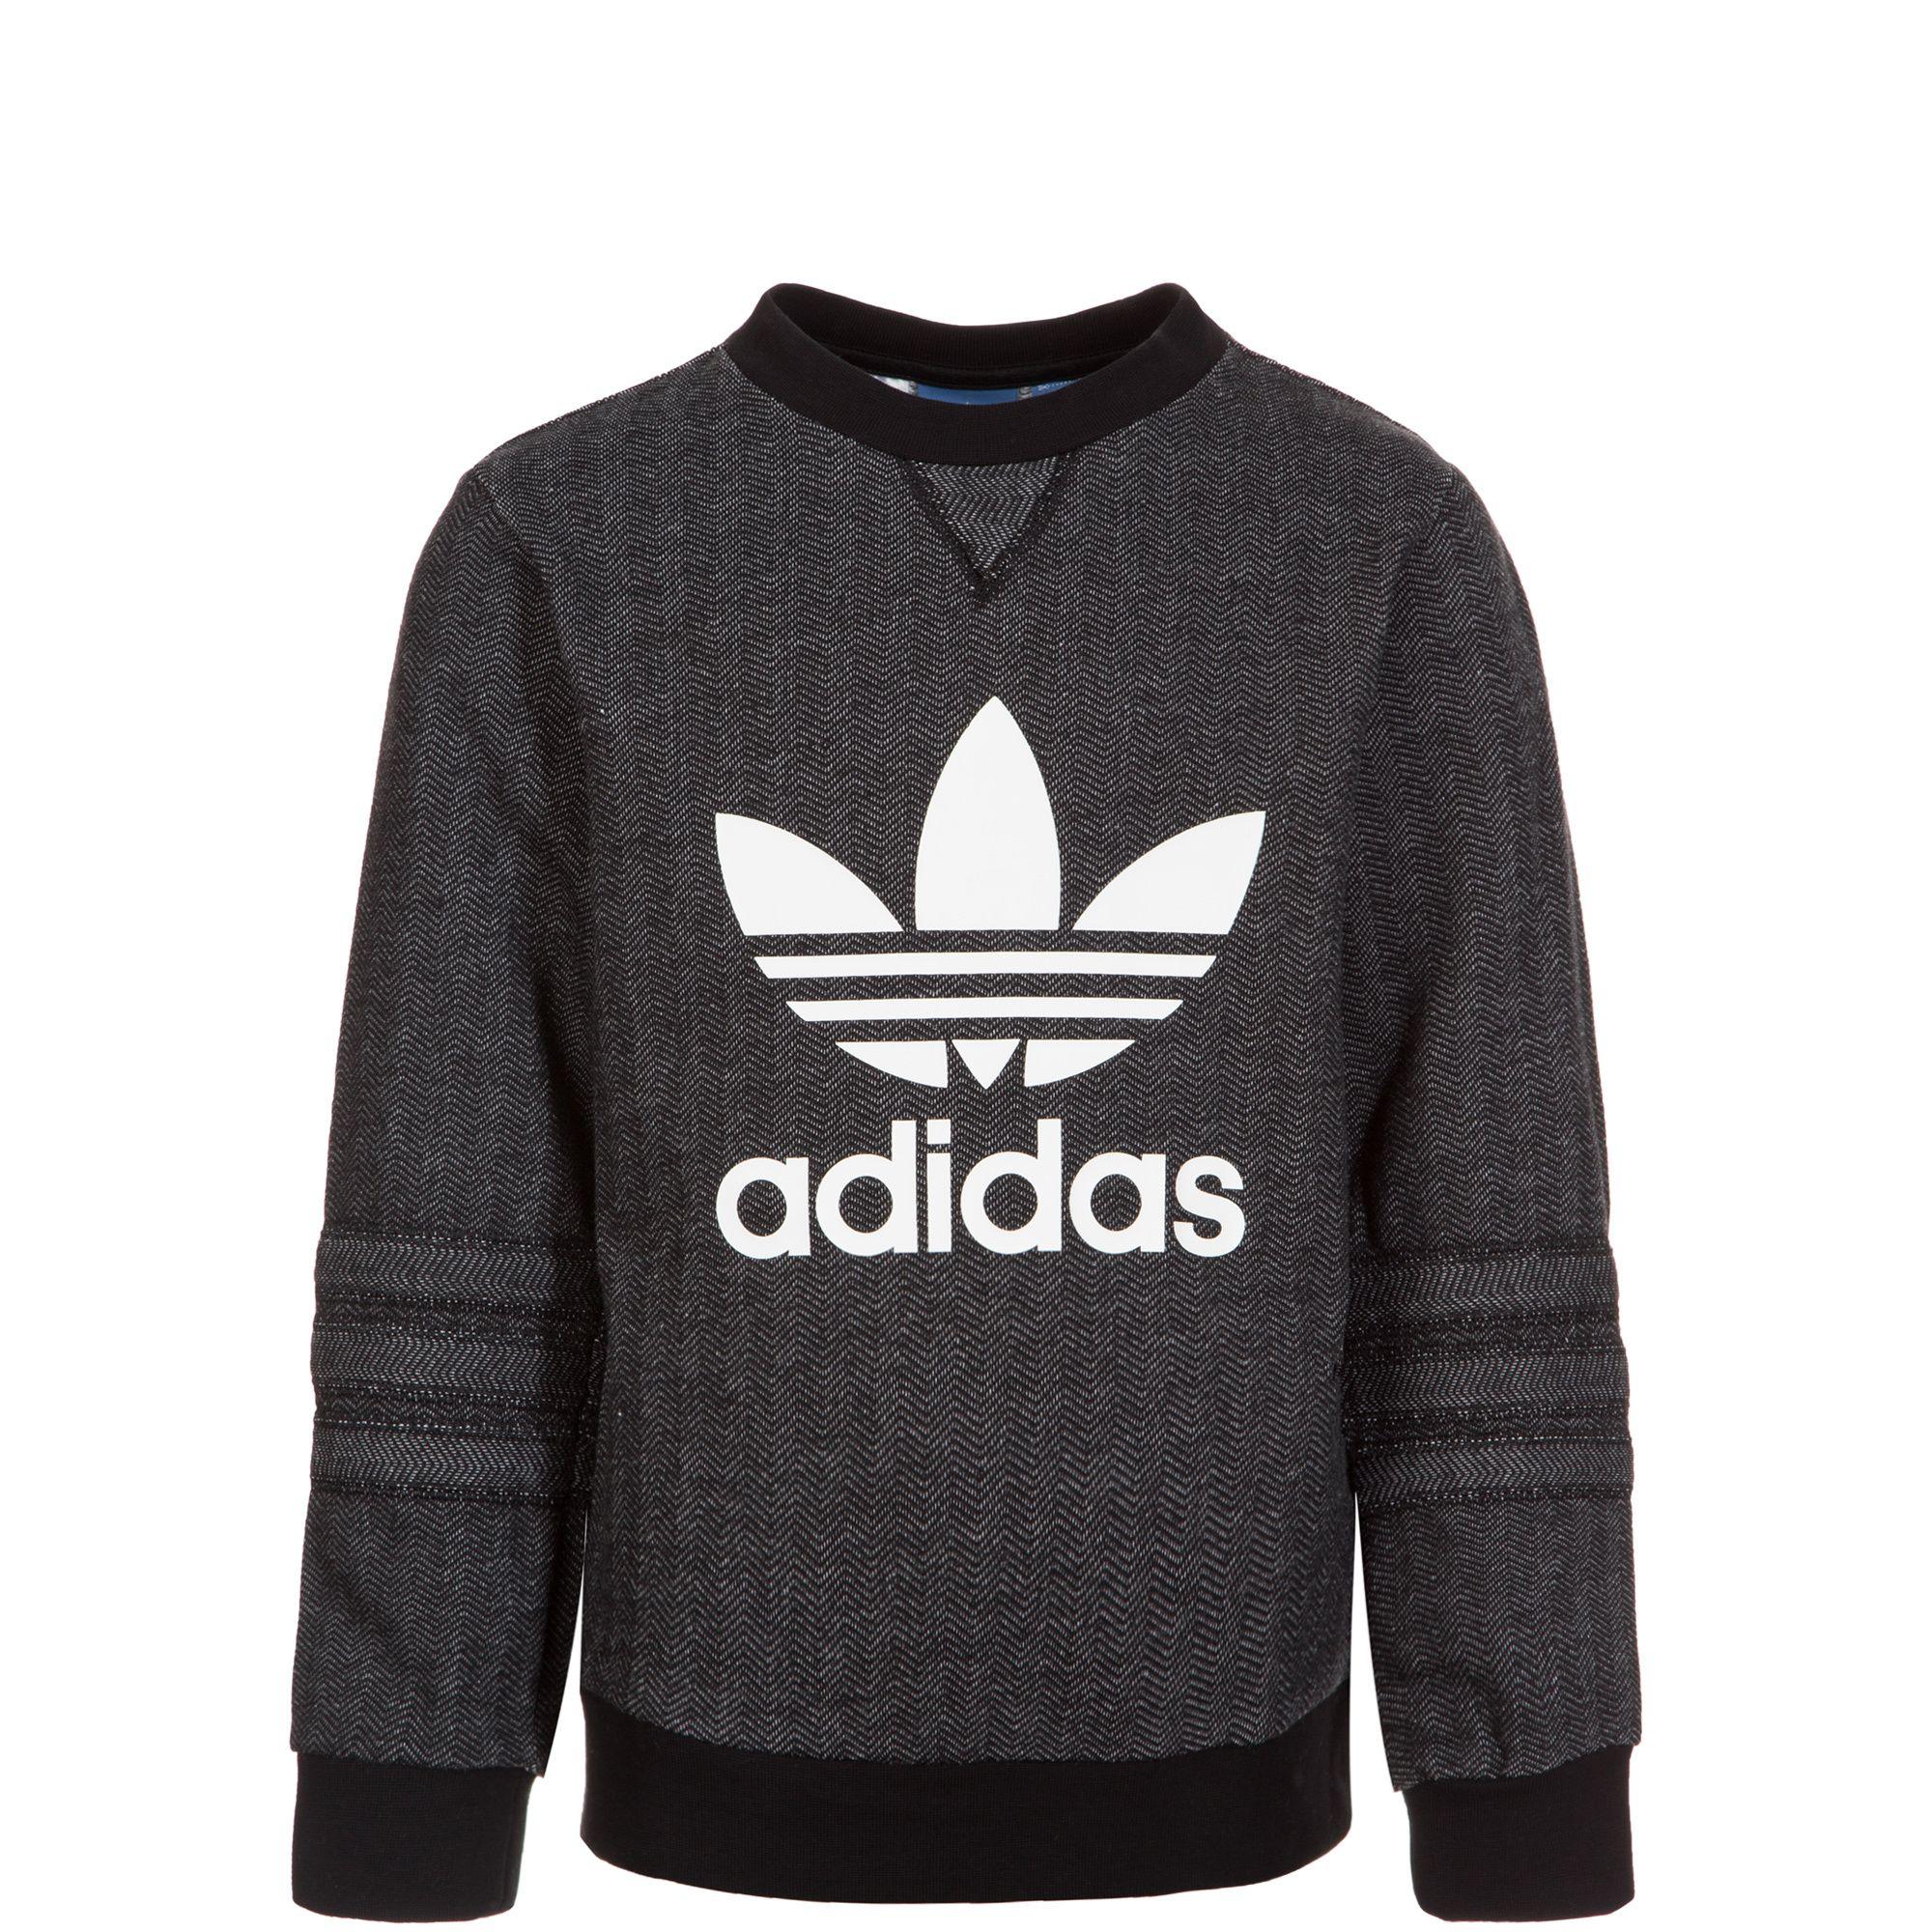 ADIDAS ORIGINALS adidas Originals Trefoil Crew Sweatshirt Kinder